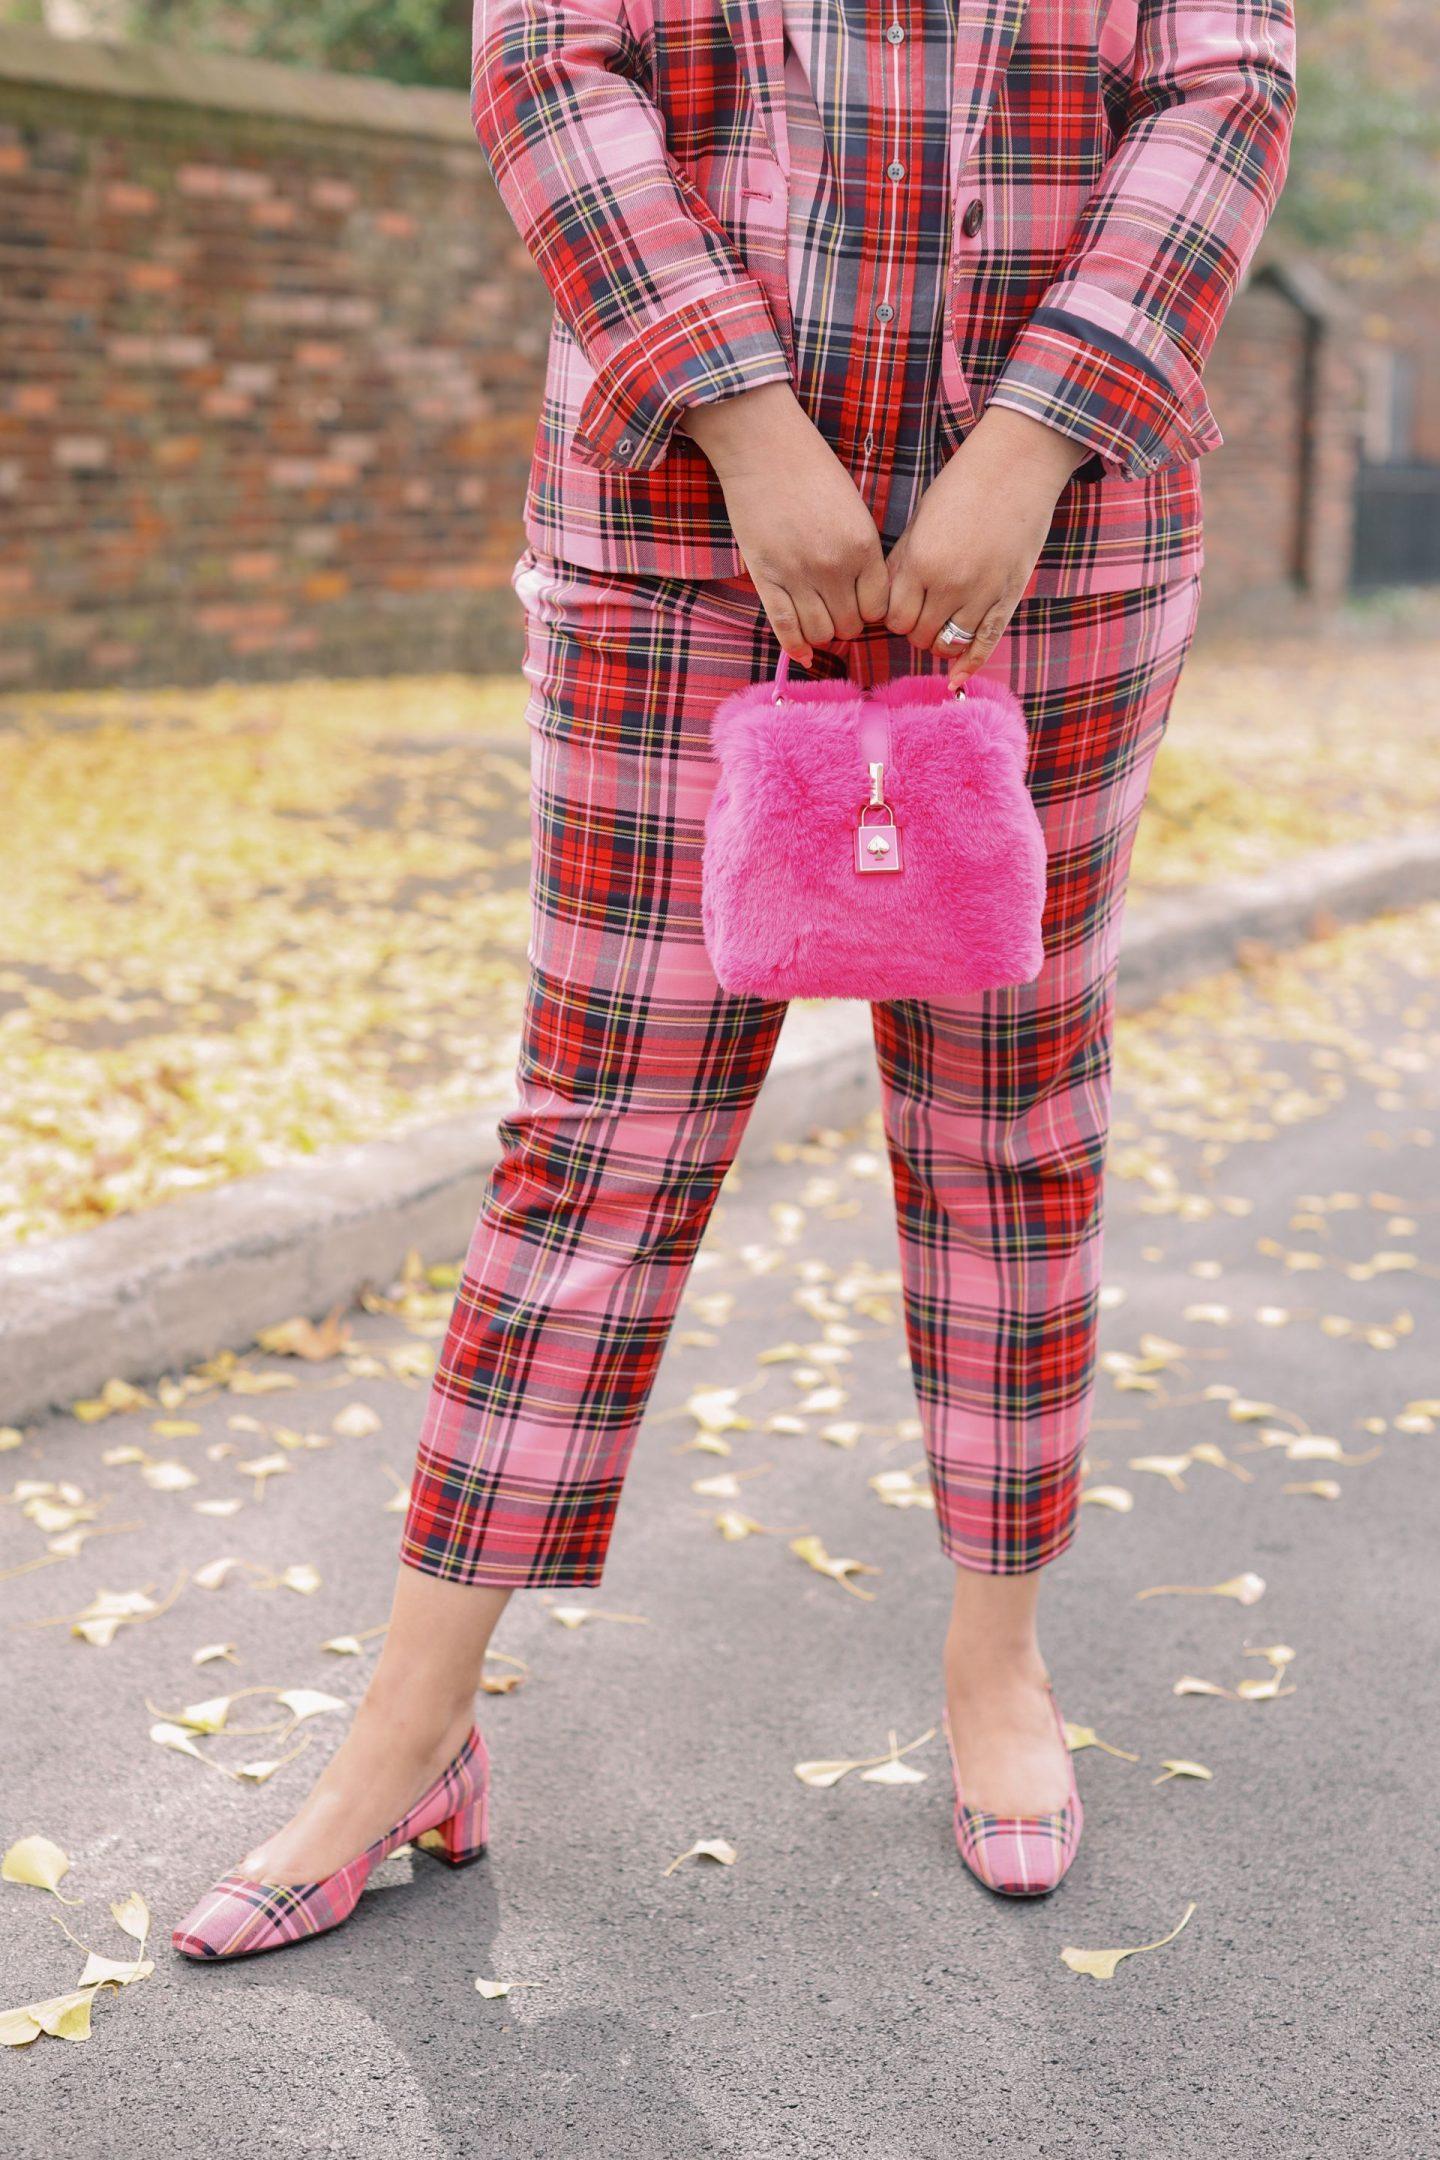 Pink Clothing by popular Kentucky fashion blog, Really Rynetta: image of a woman wearing a J. Crew pink Stewart tartan suit and a tartan button up shirt.